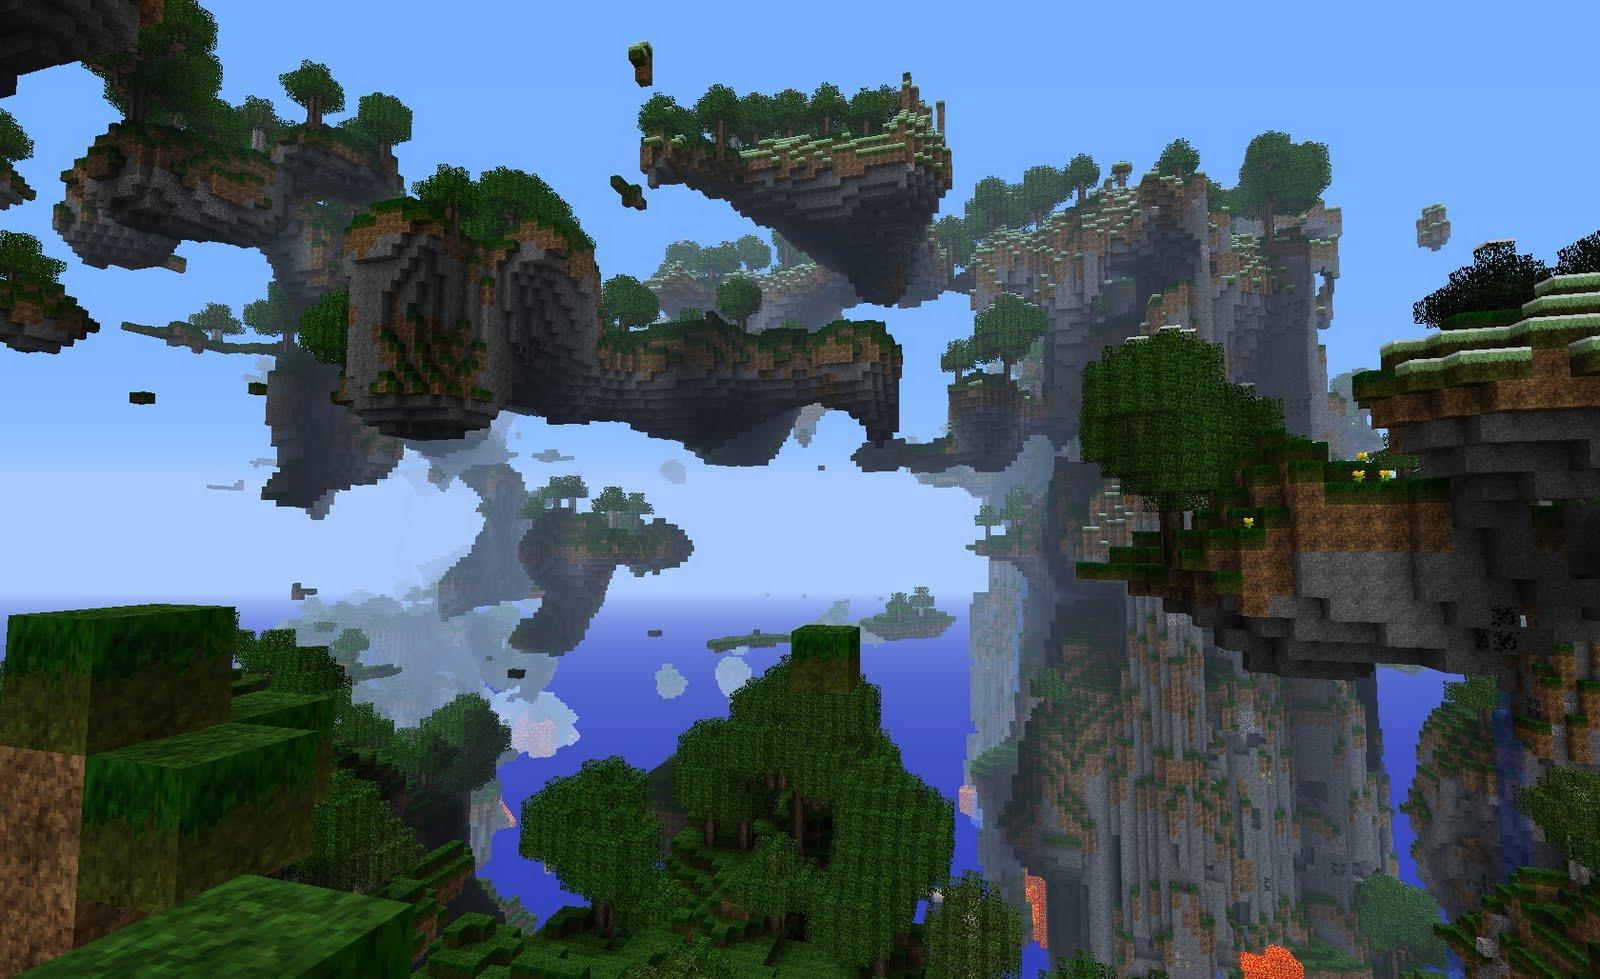 Free Download Of Minecraft Hd 1080p Wallpaper Minecraft Hd